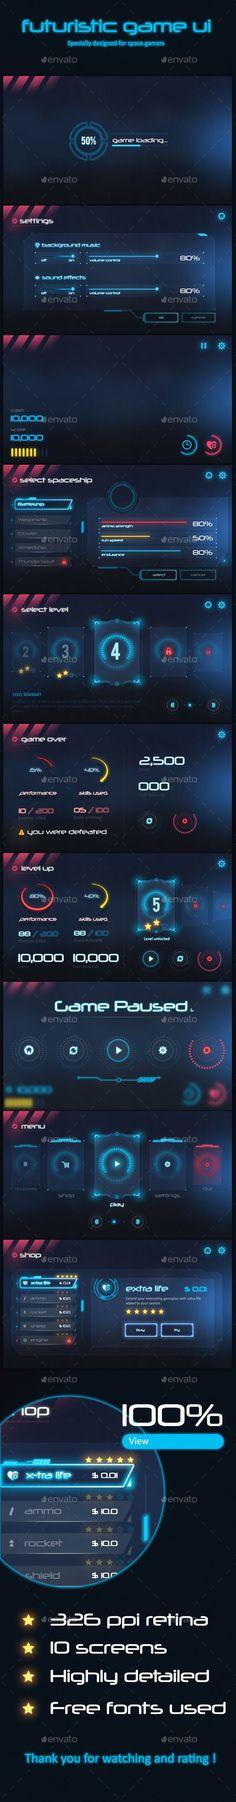 Futuristic Game Ui Download here: https://graphicriver.net/item/futuristic-game-ui/19577793?ref=KlitVogli